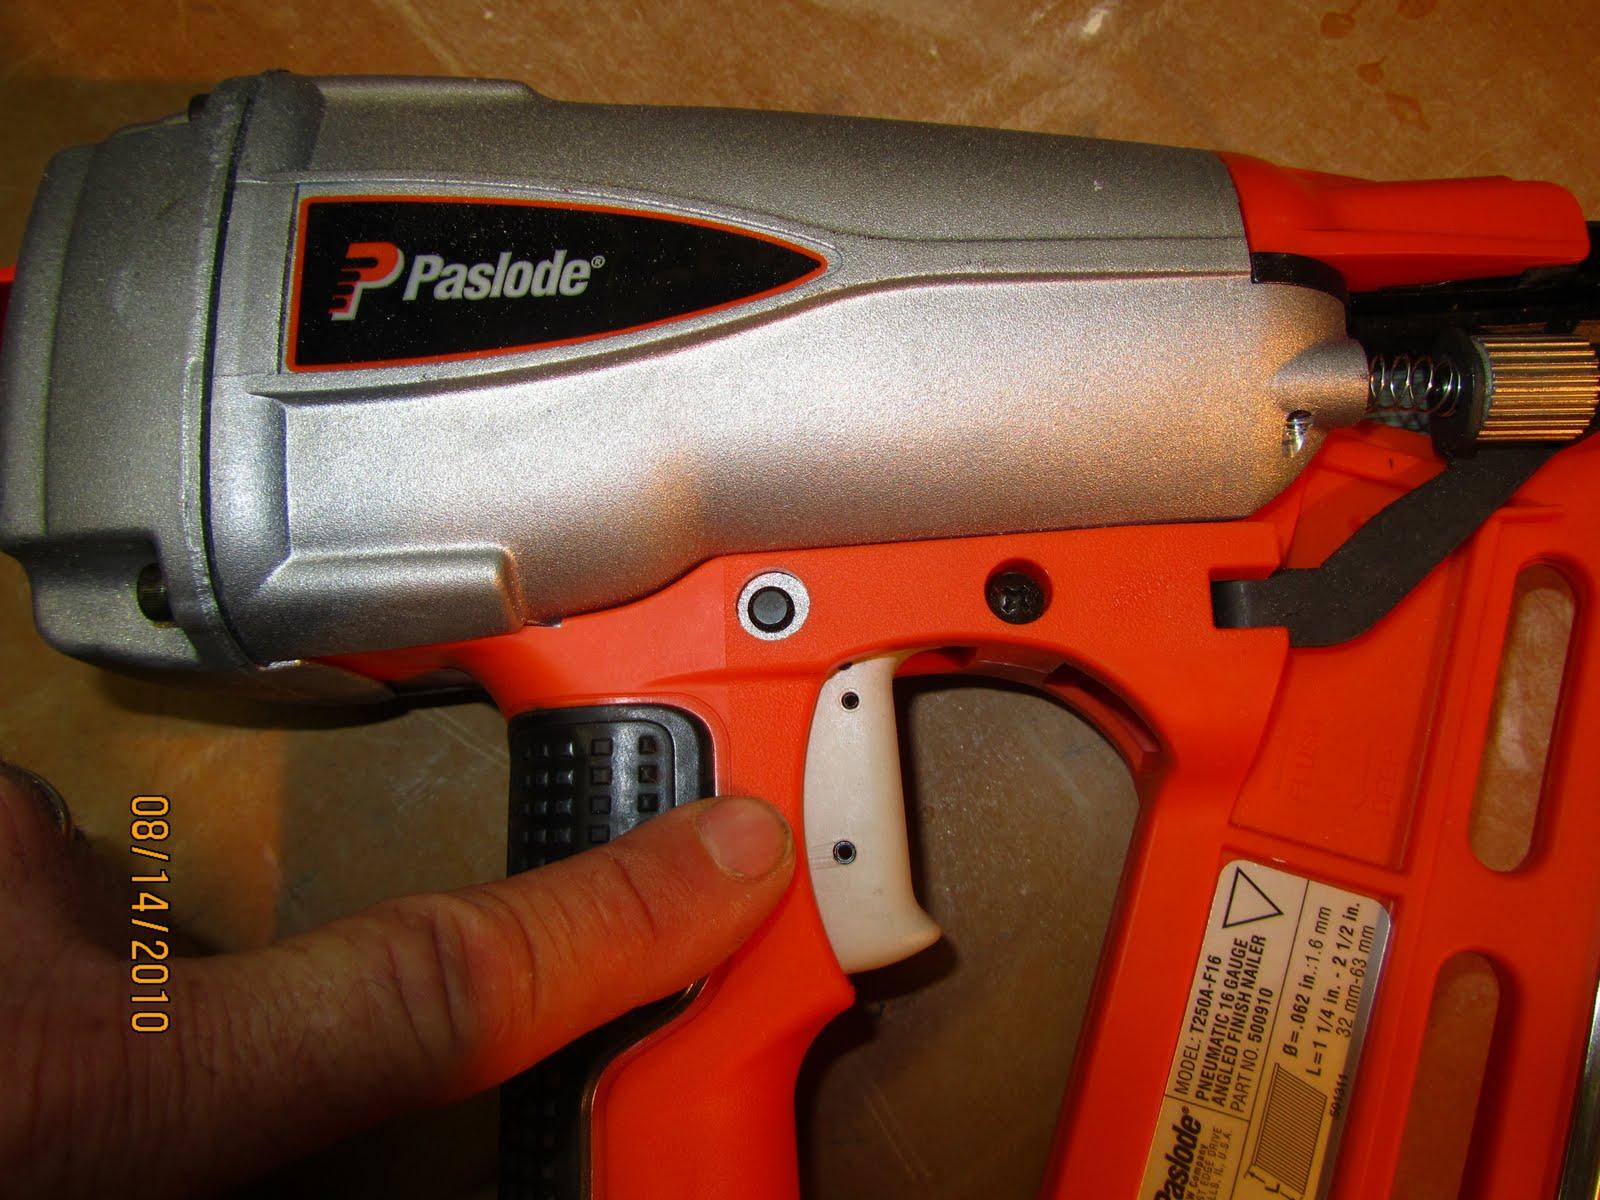 Paslode T250A 16 Gauge Finish Nailer - A Concord Carpenter